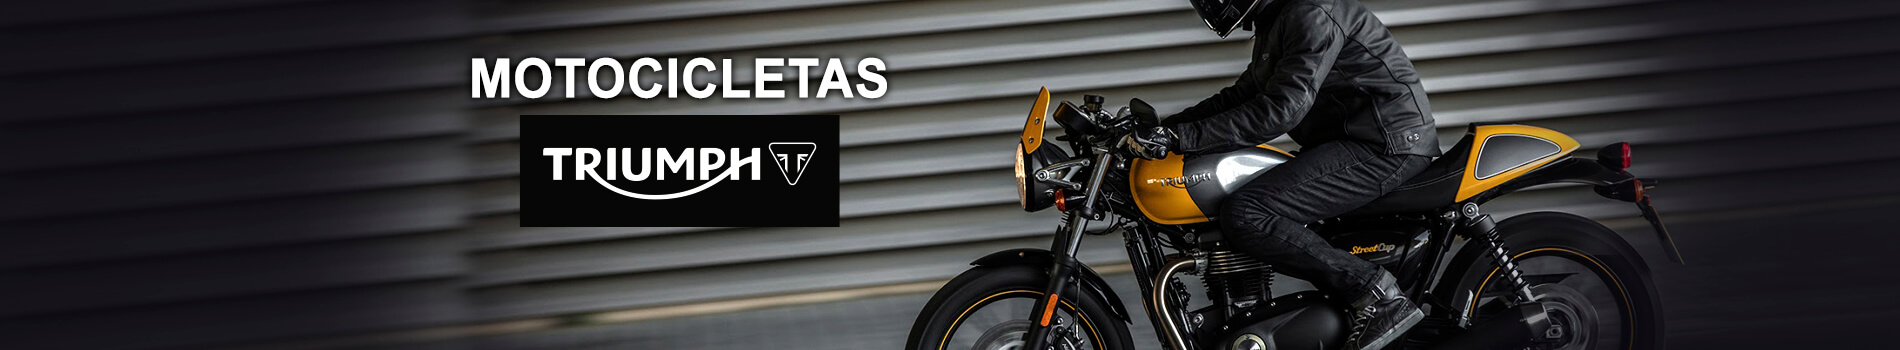 Motocicletas Triumph